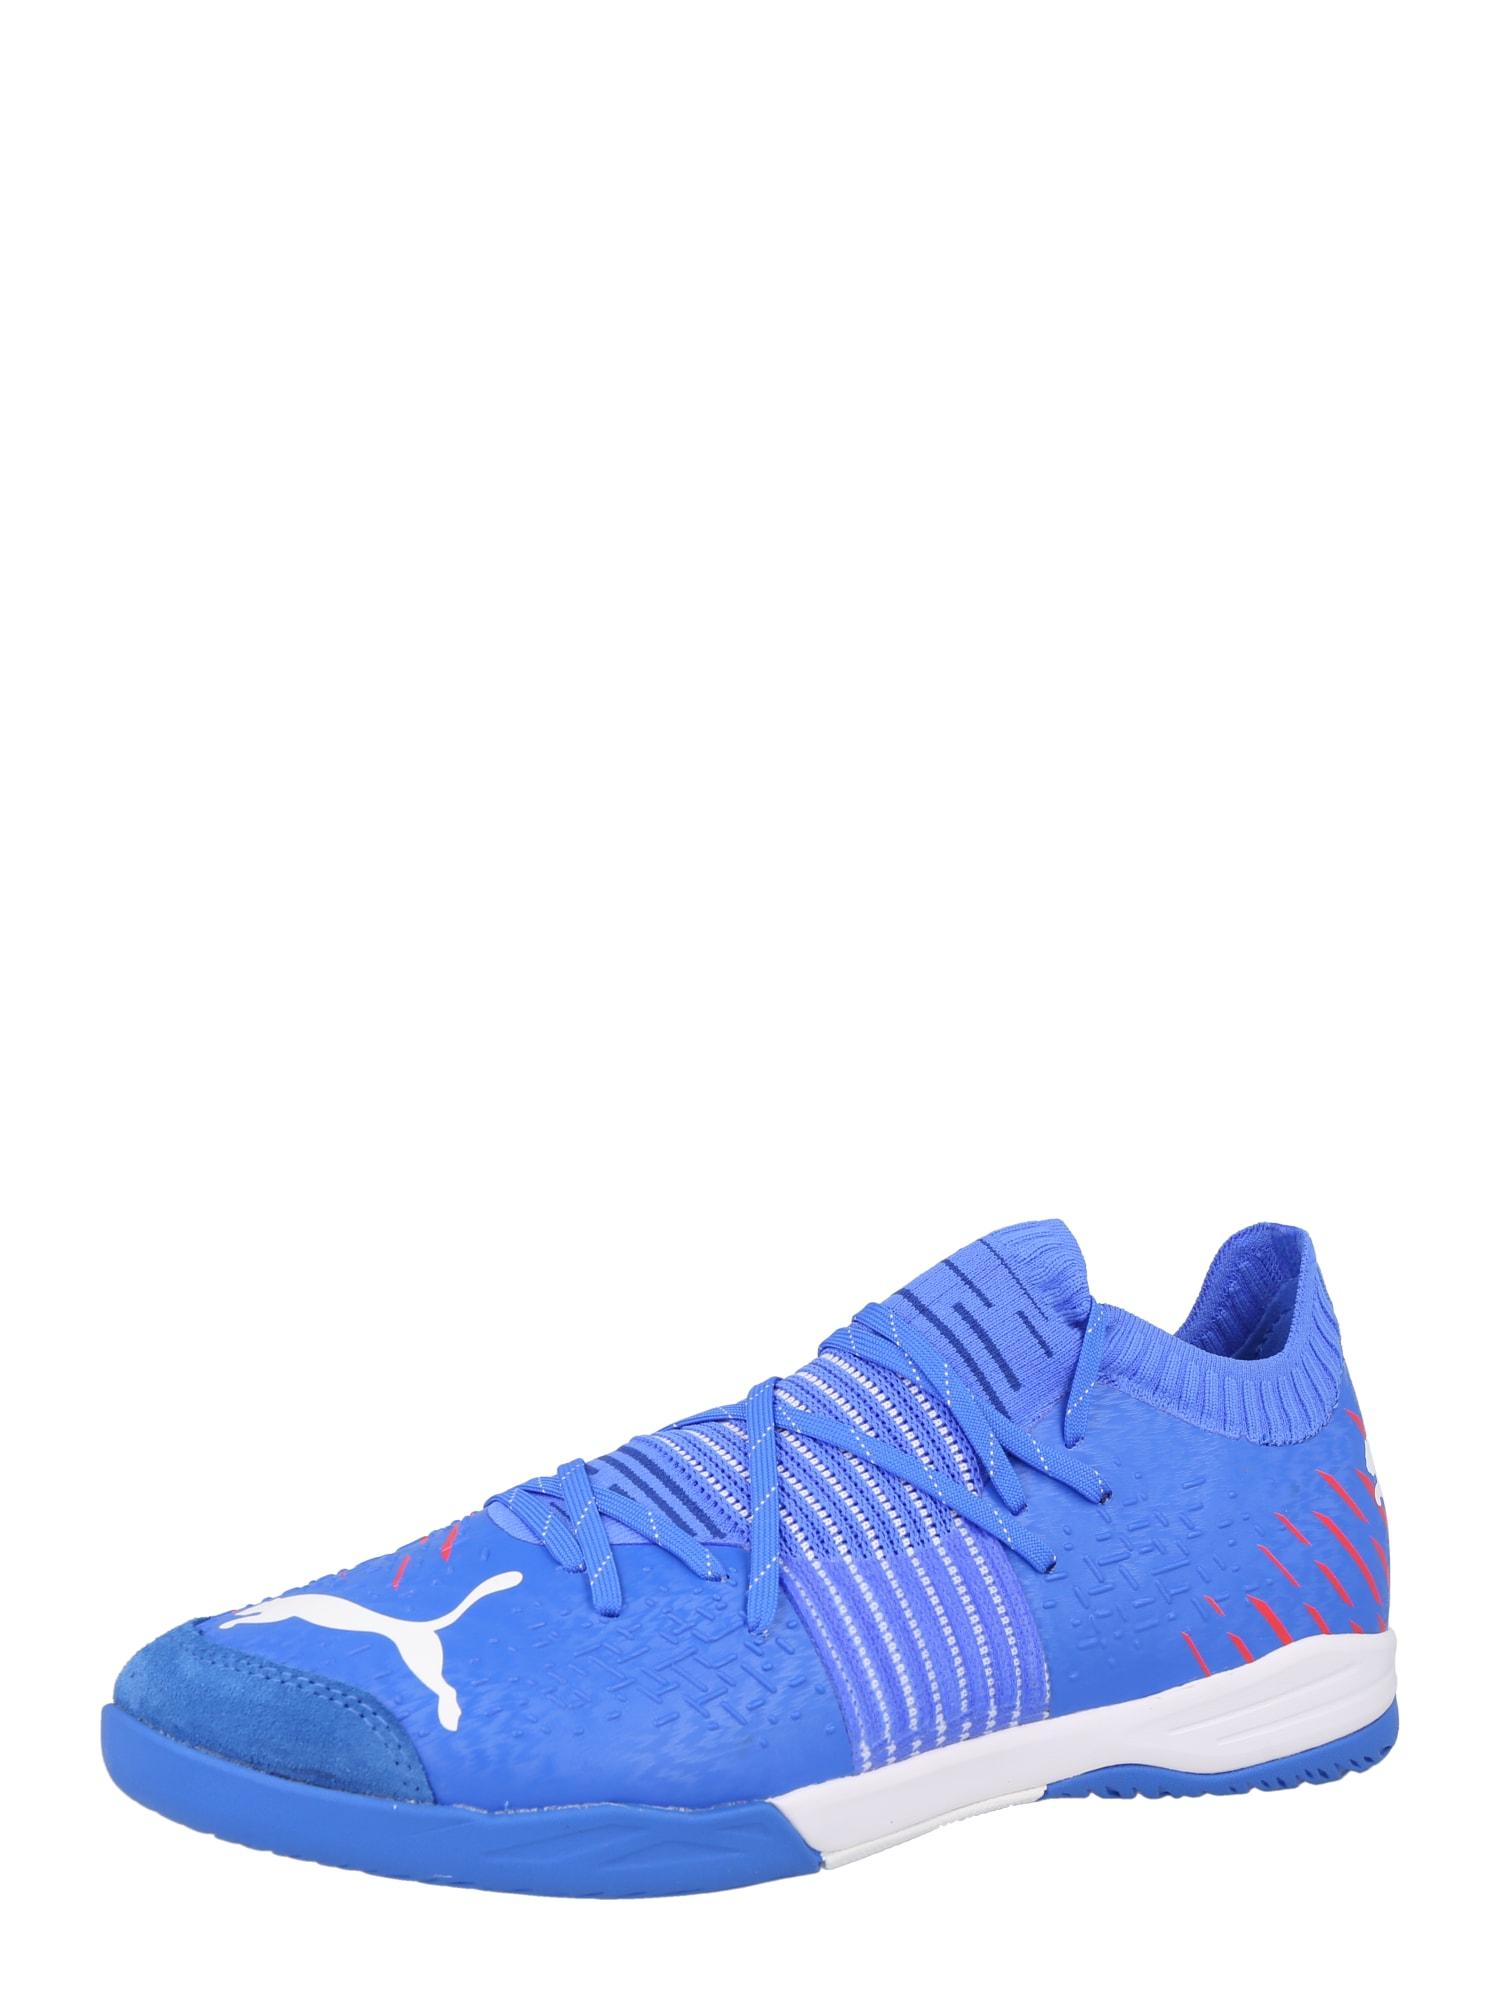 PUMA Scarpa sportiva 'Future'  blu / colori misti male shop the look